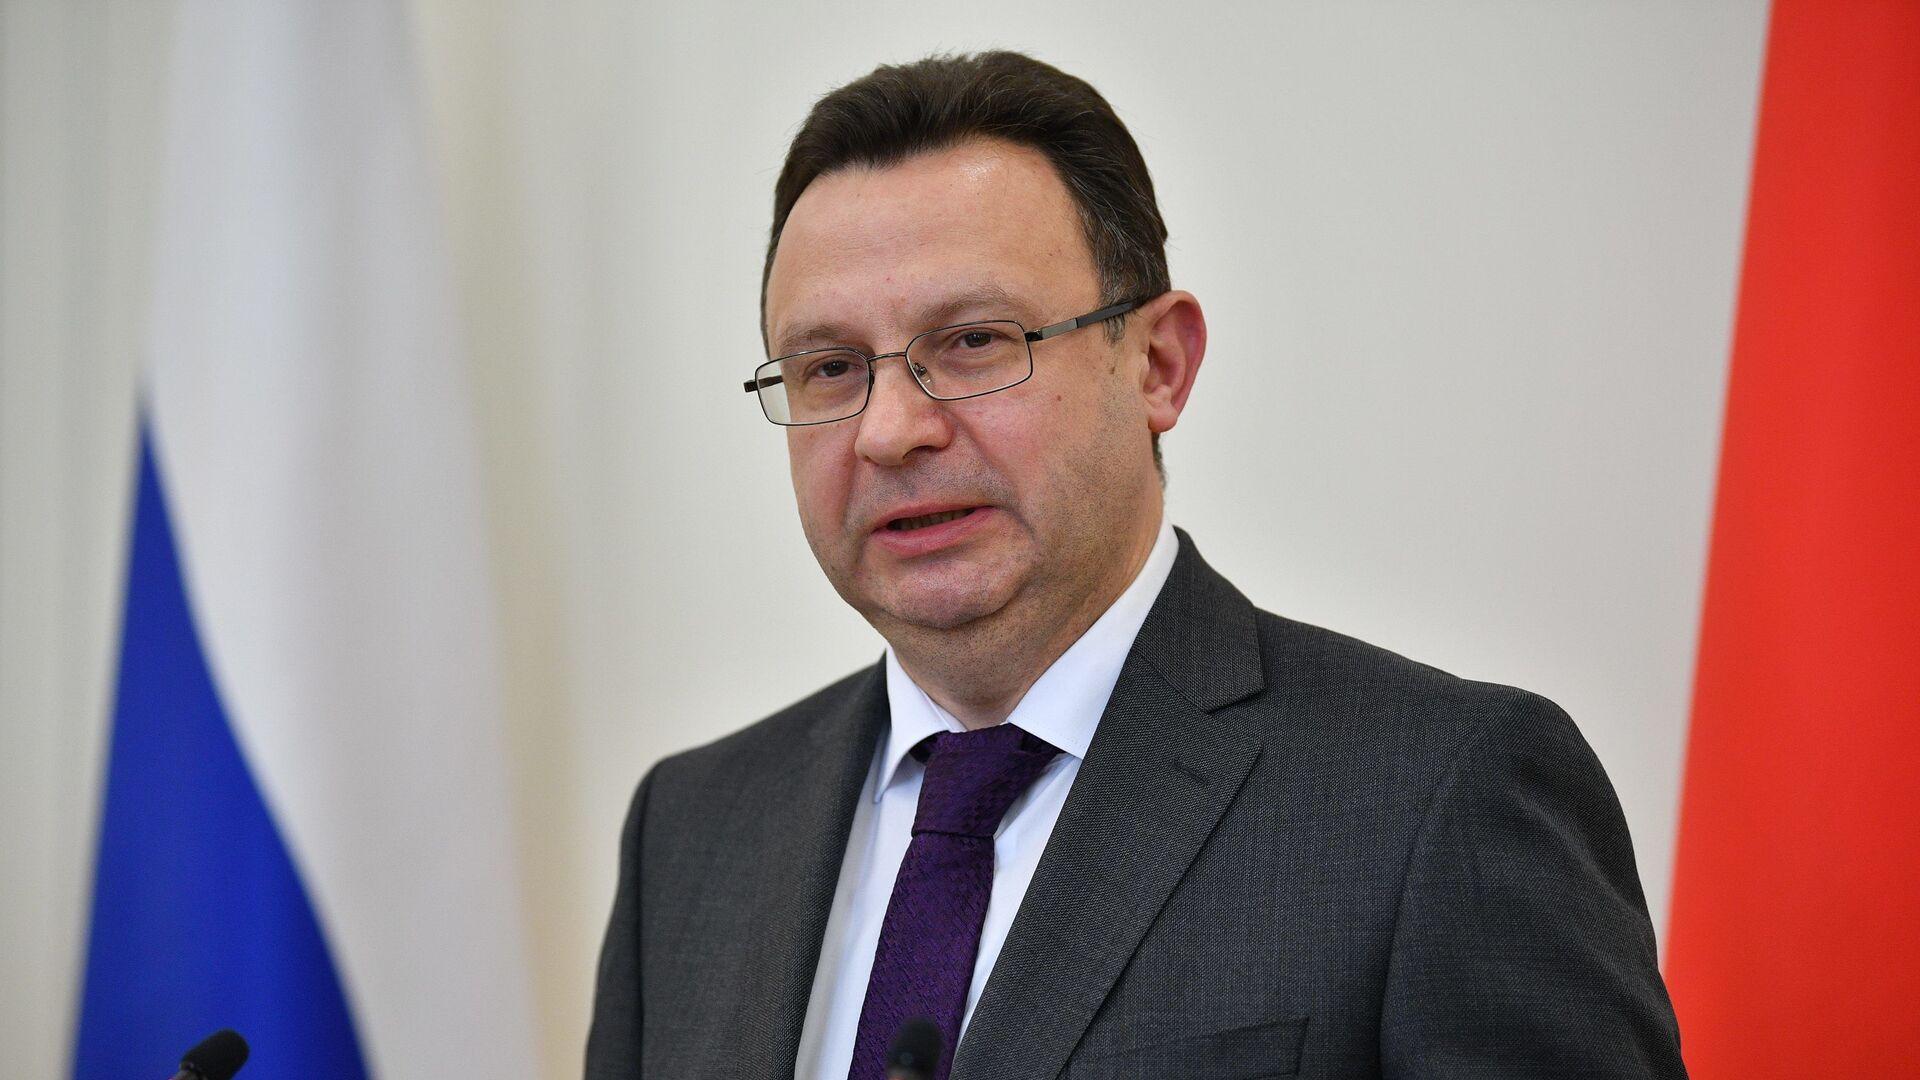 Министр здравоохранения Дмитрий Пиневич - Sputnik Беларусь, 1920, 25.09.2021